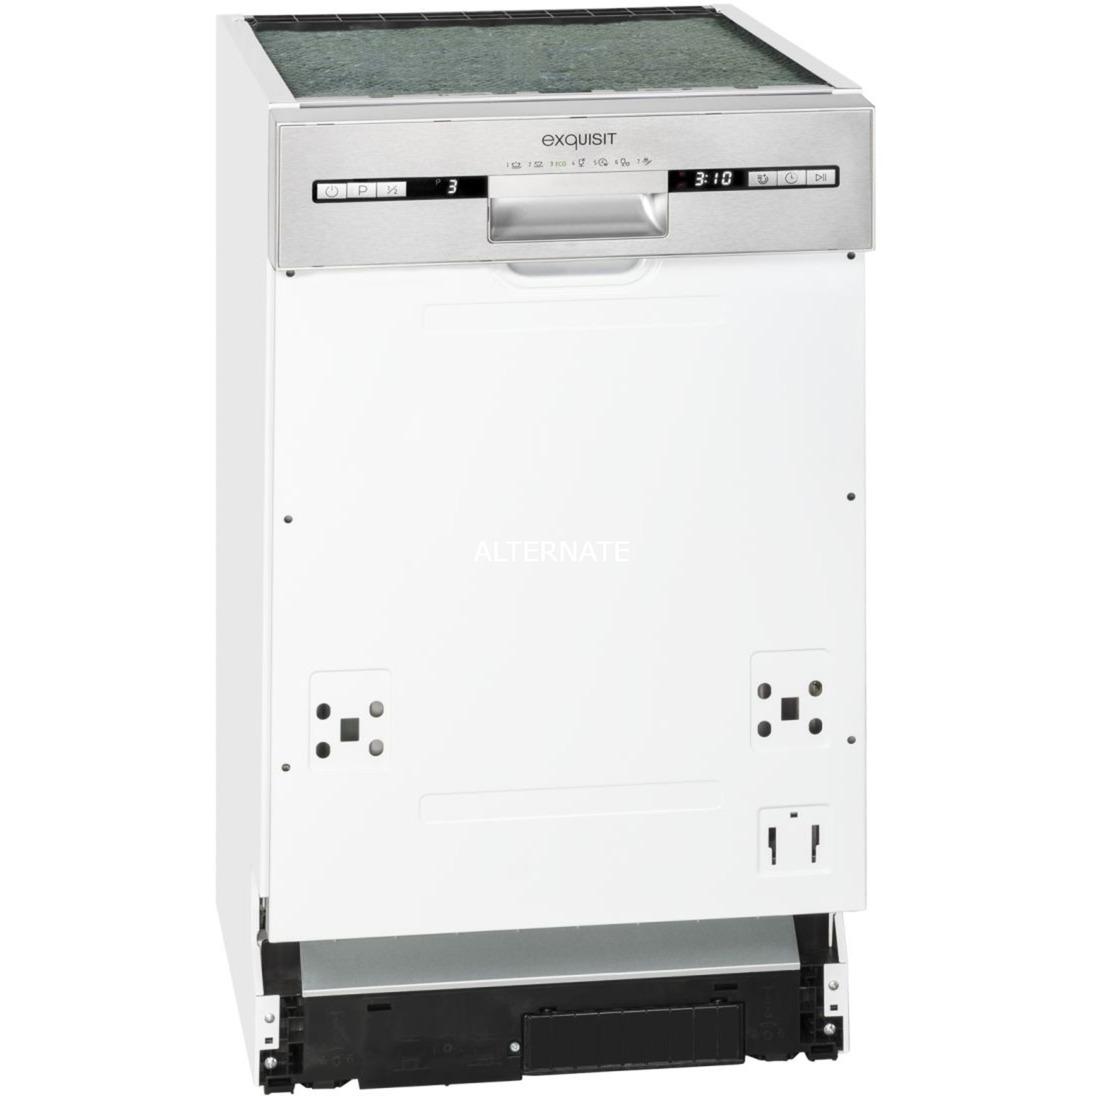 sumicorp.com inox Exquisit EGSP 2109.1E Splmaschine Elektro ...